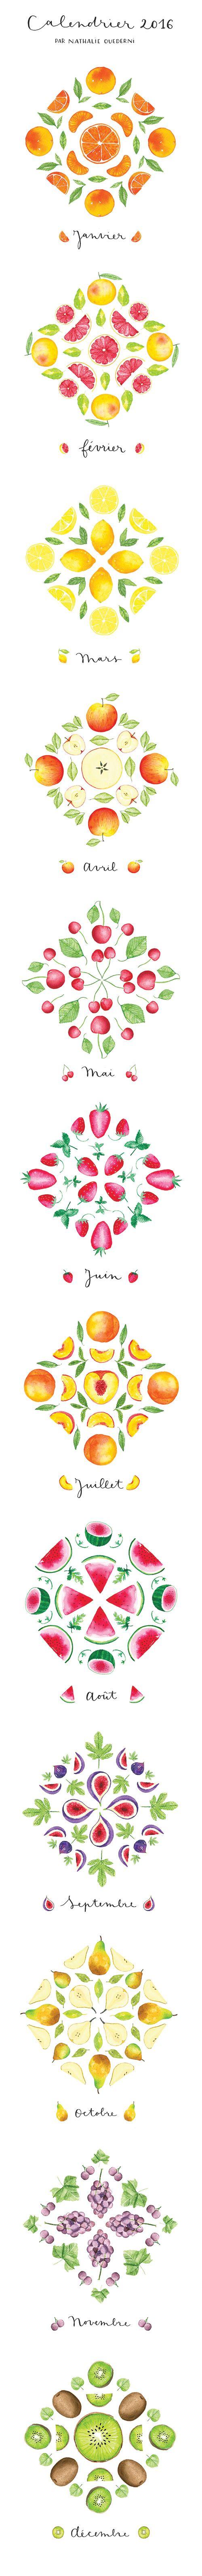 Watercolor Fruit Calendar by Nathalie Ouederni - www.nathalieouederni.com